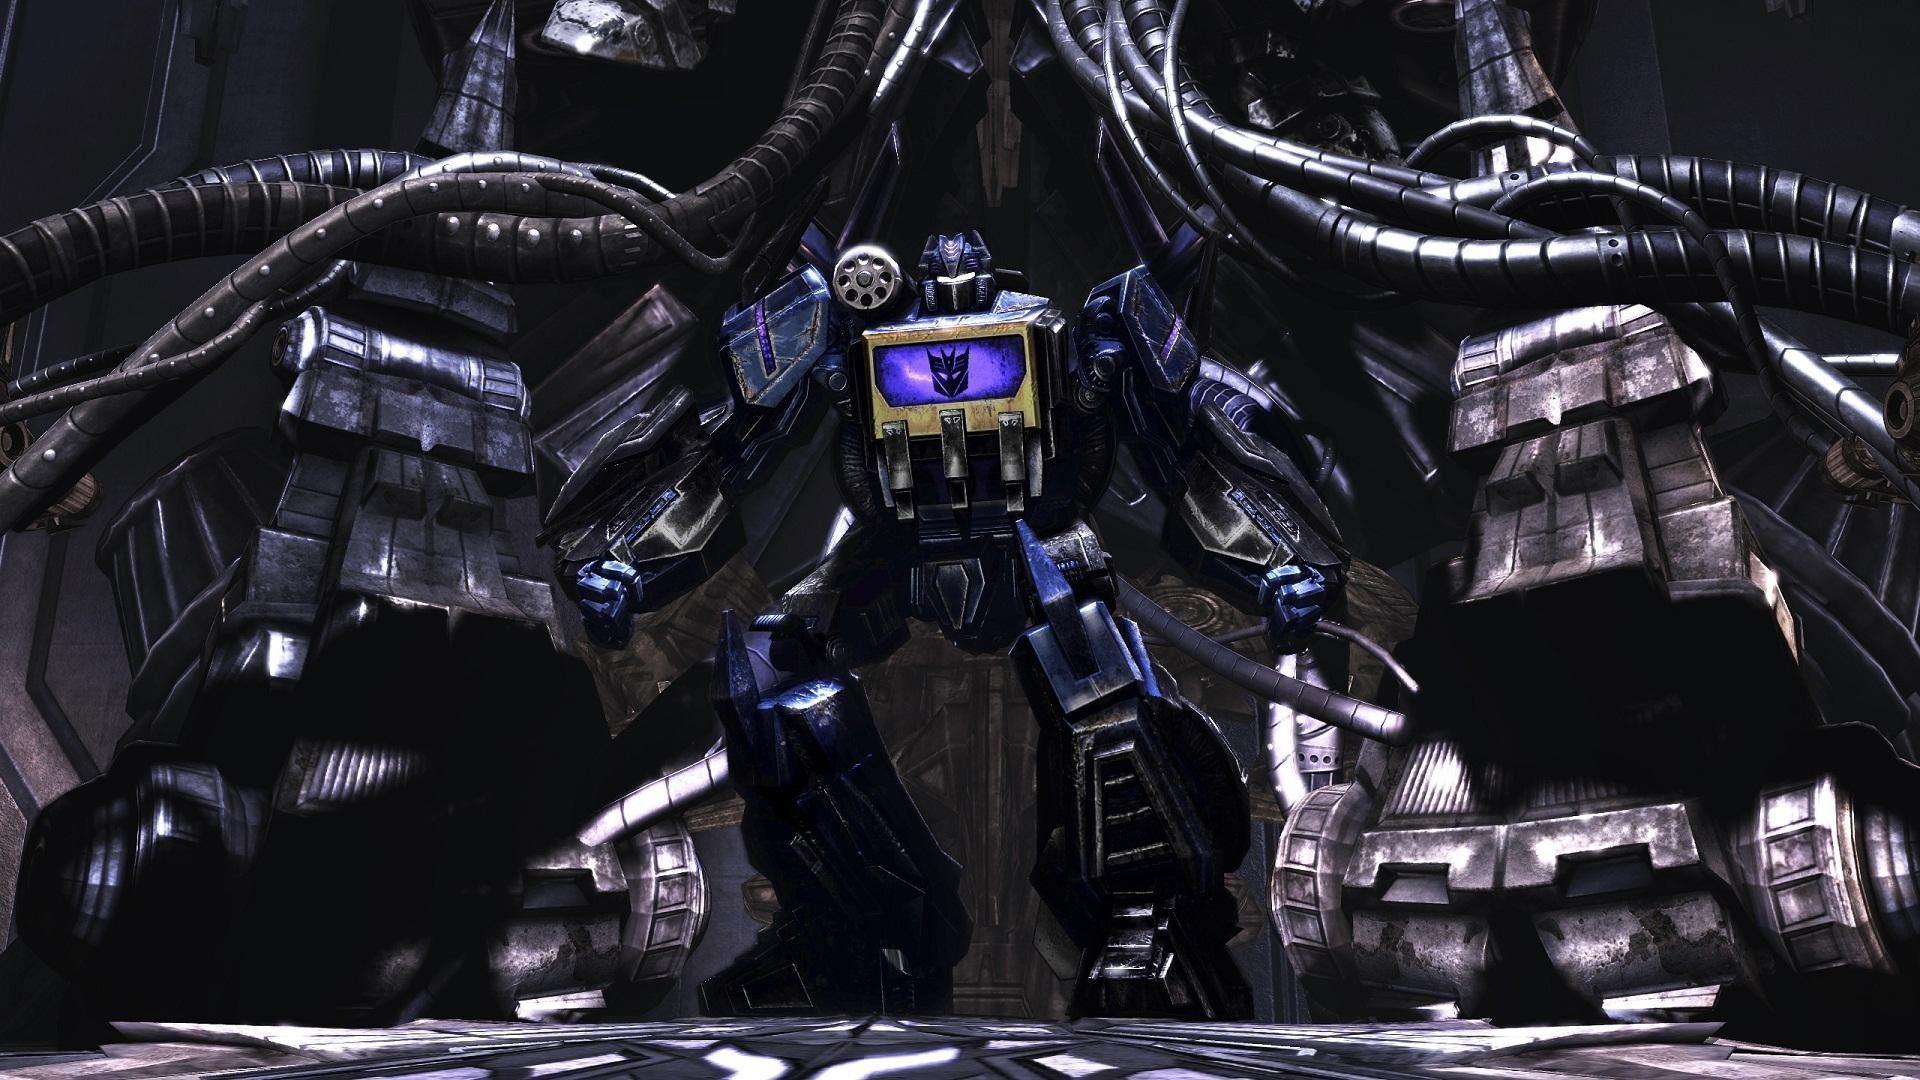 Transformers Soundwave Wallpaper (64+